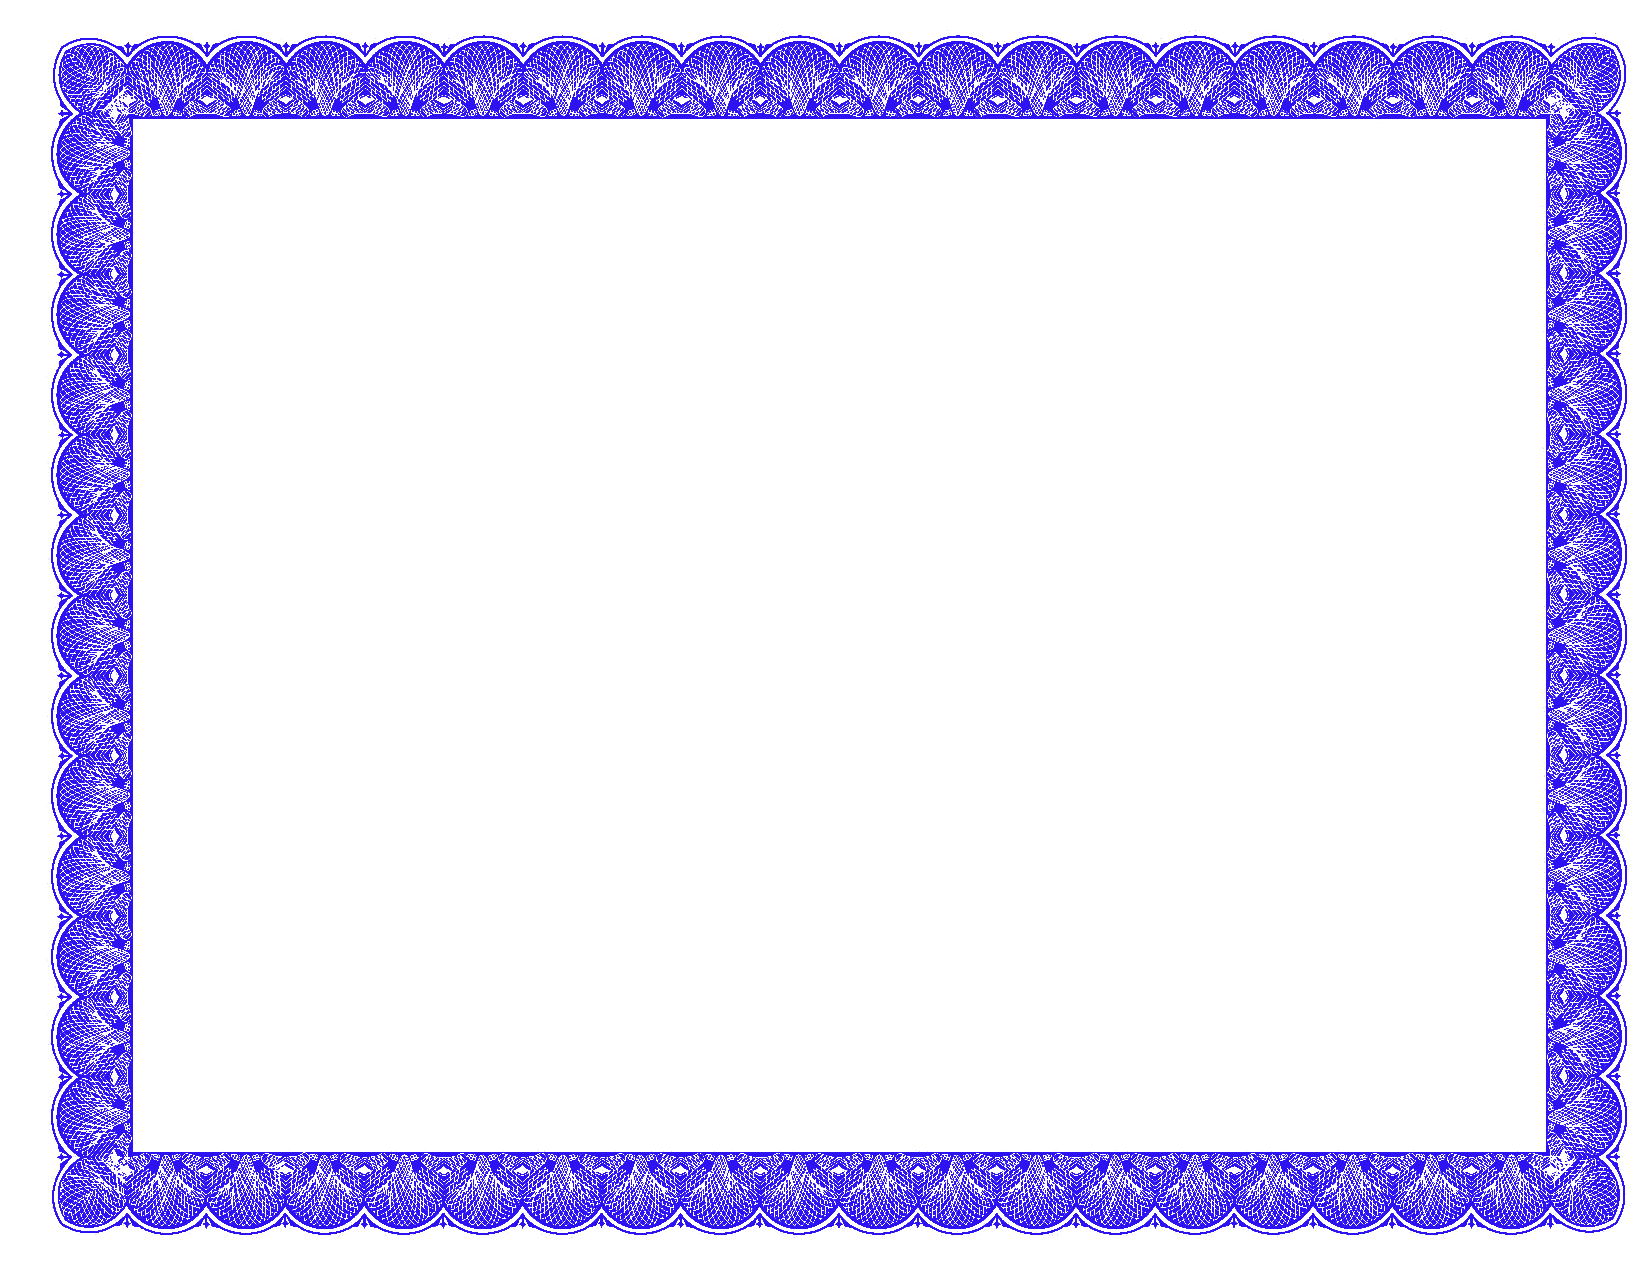 10 Free Certificate Border Psd Images Blue Certificate Border Clip